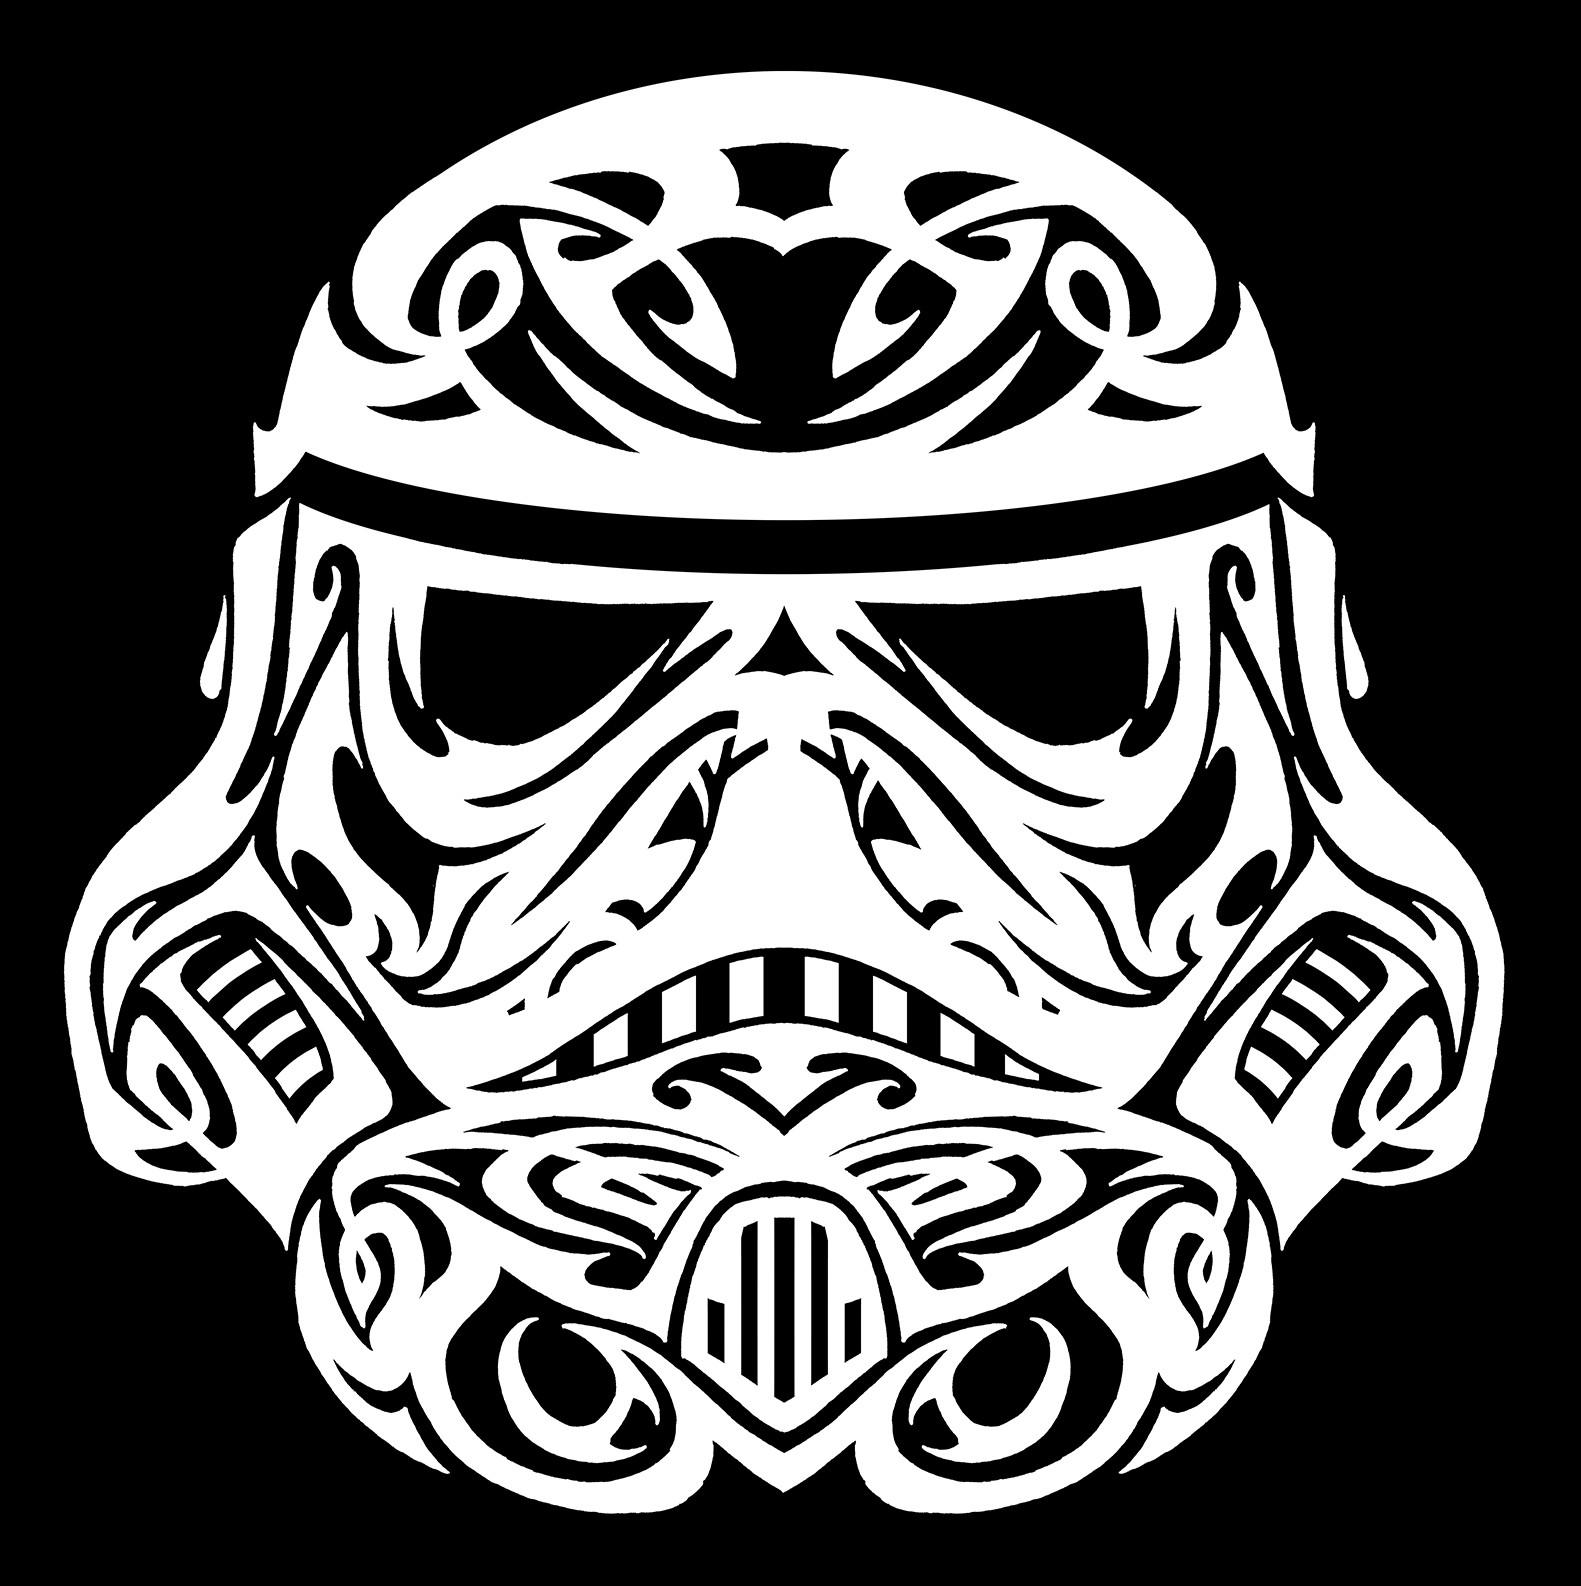 Caleb prochnow trooper low res